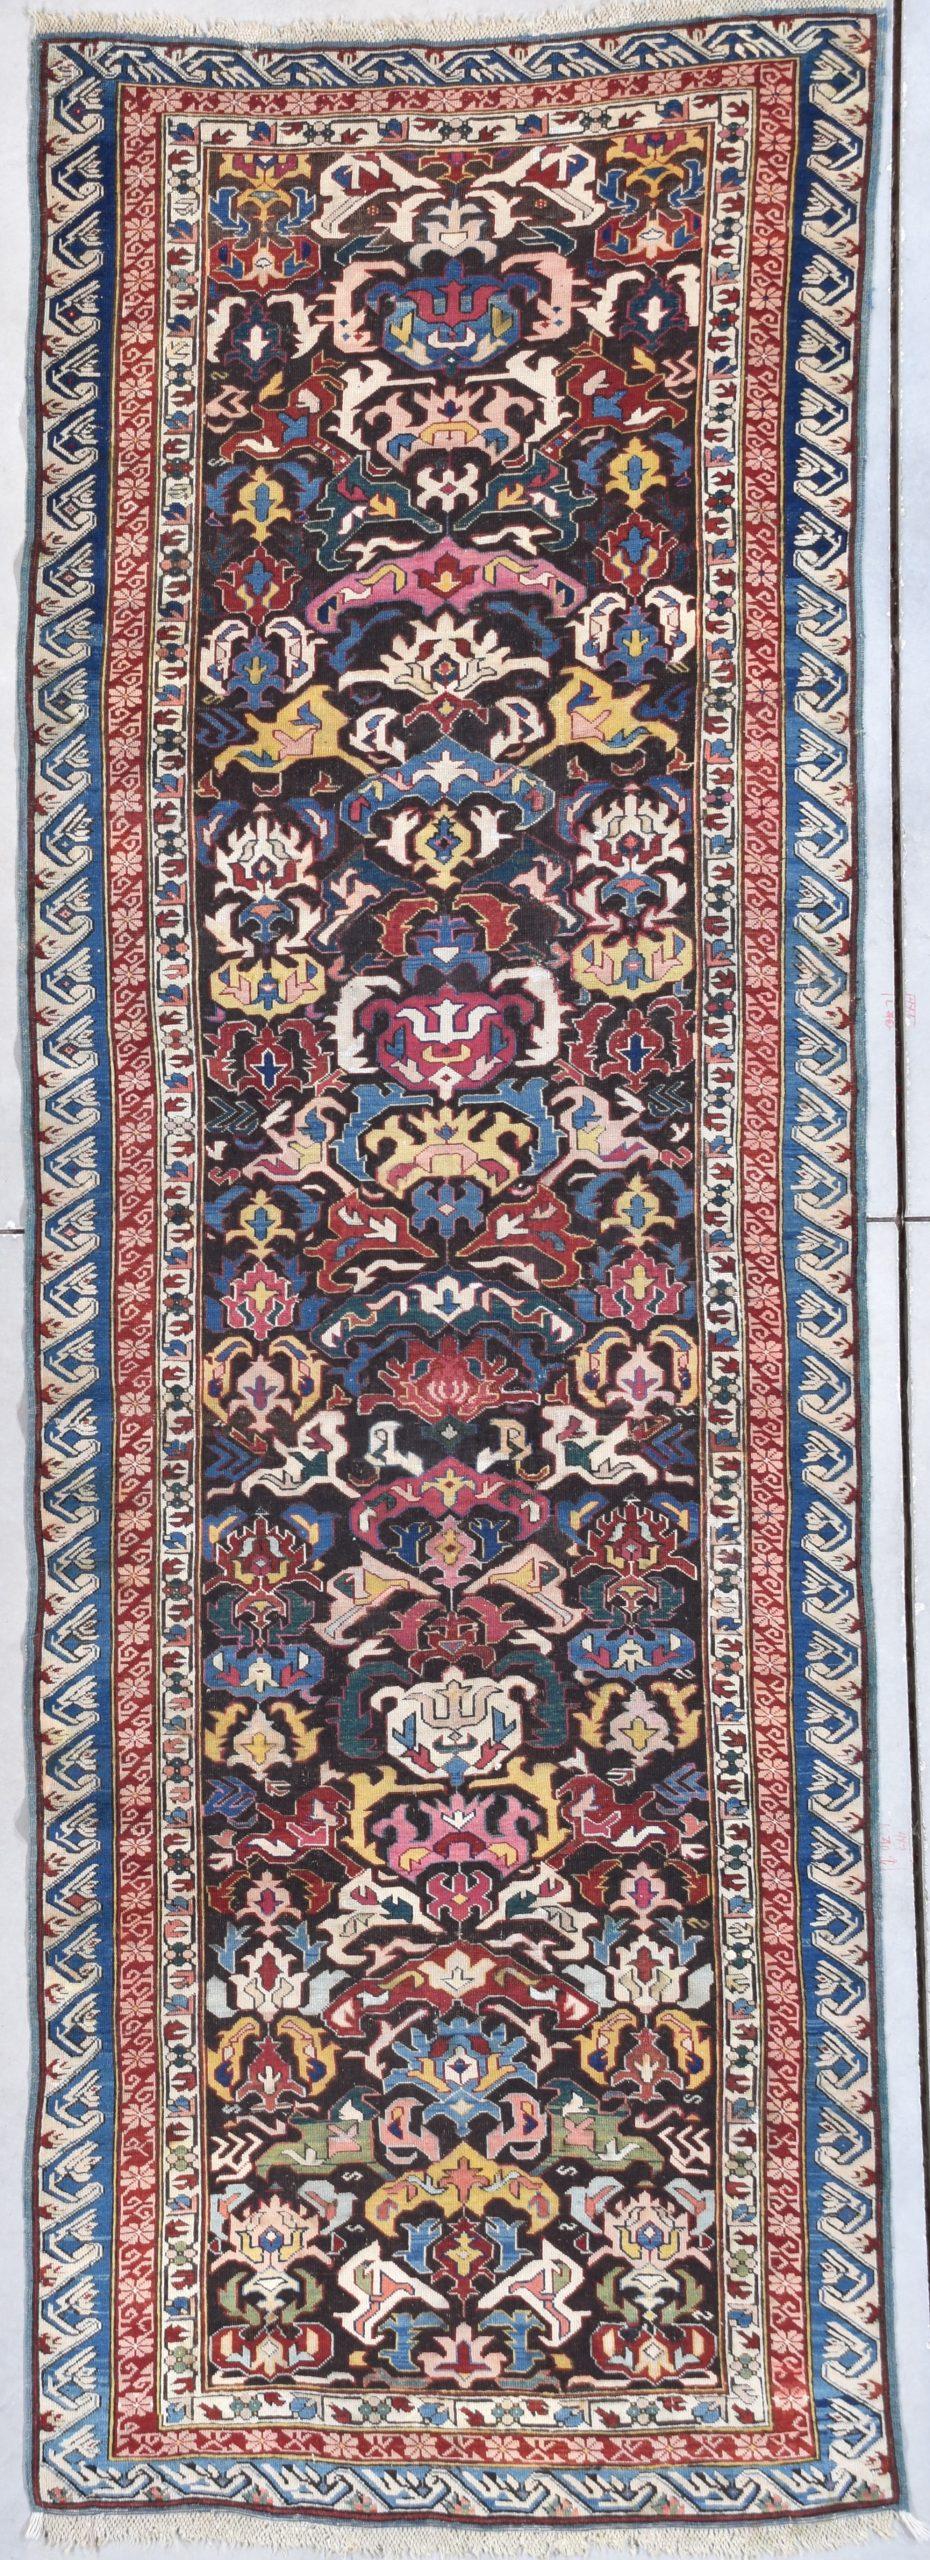 7909 bidjov kuba rug image